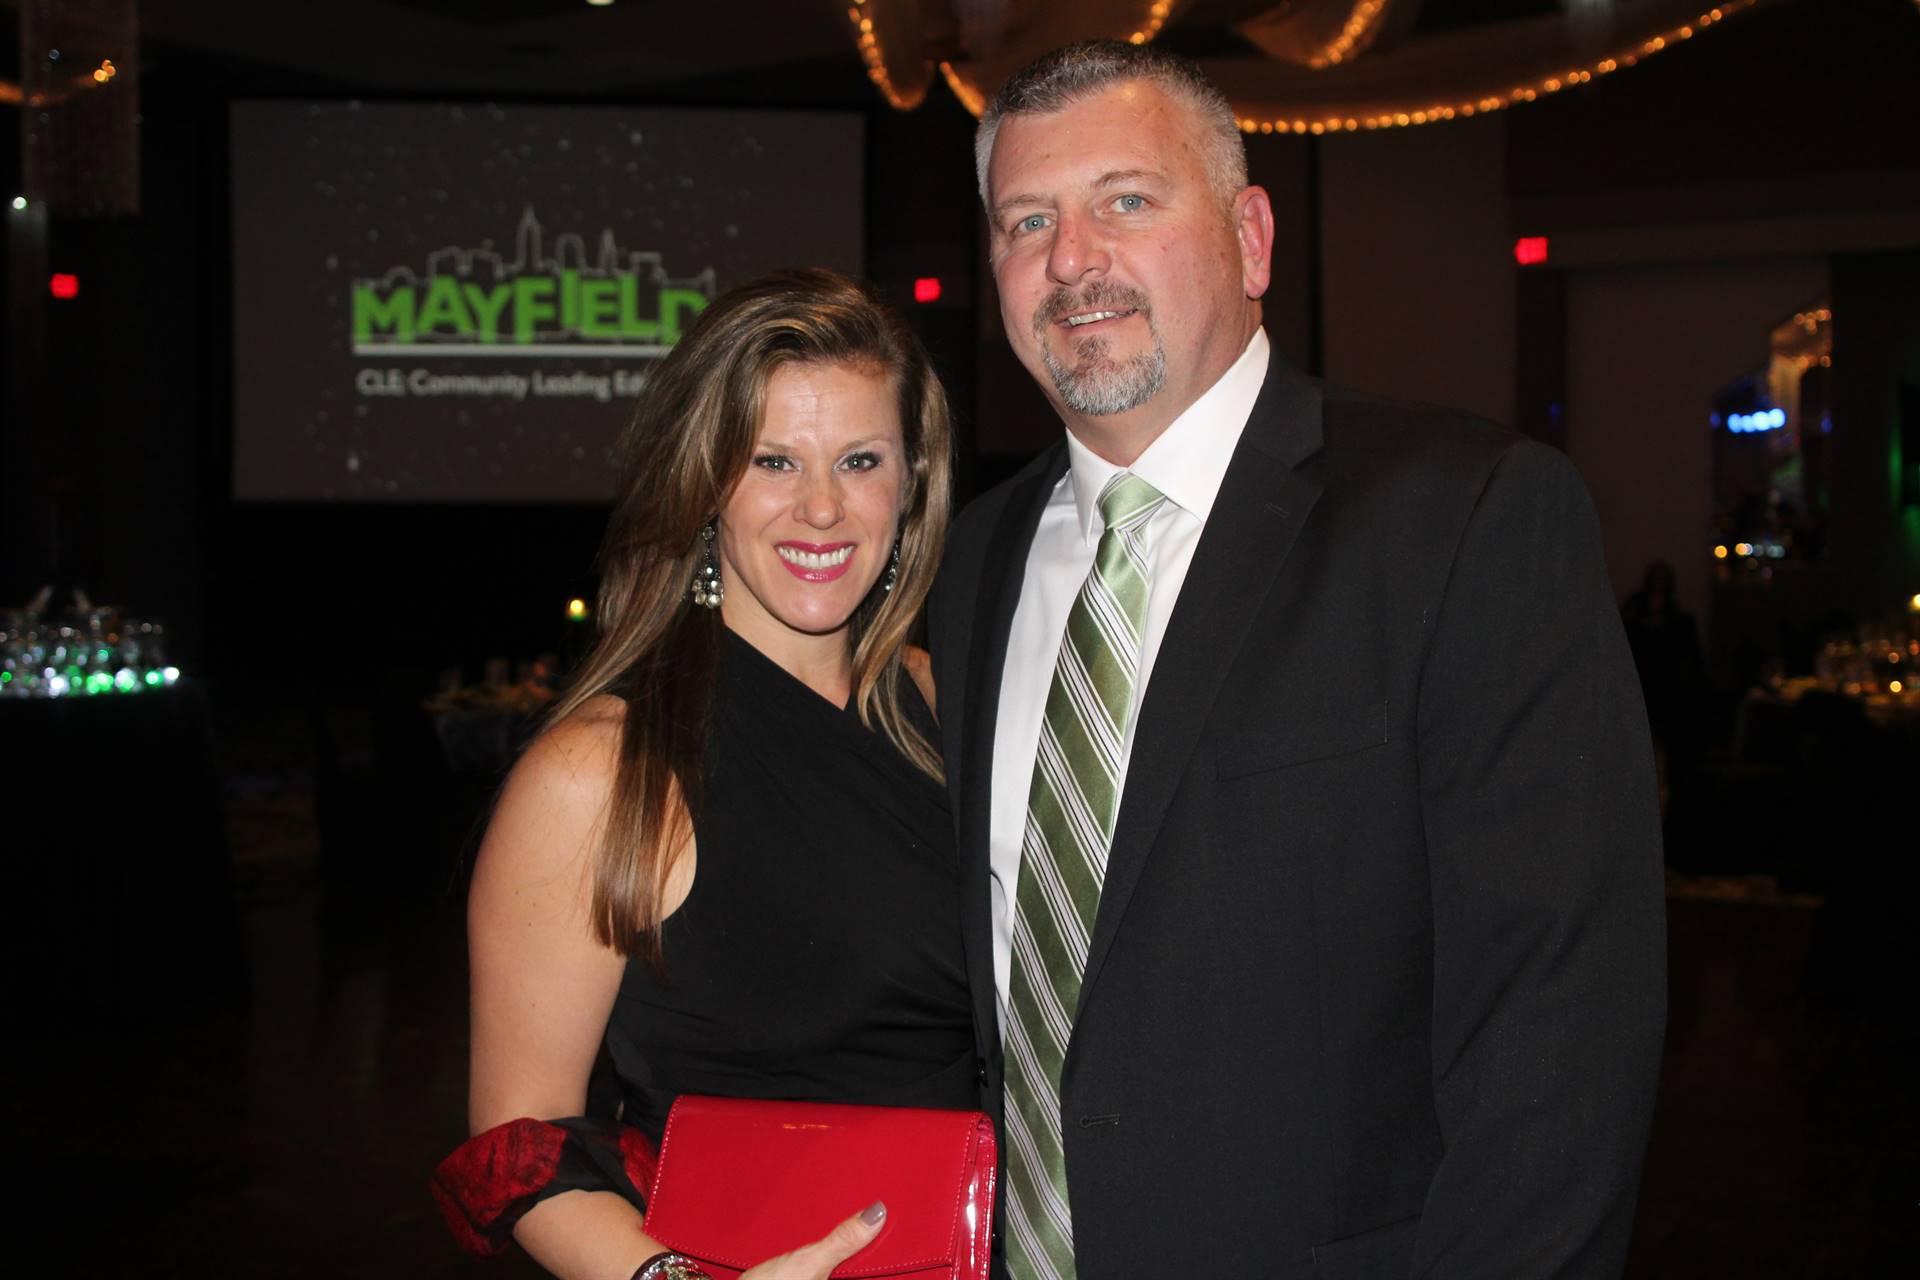 Green Tie Gala 2019 Mayfield City Schools